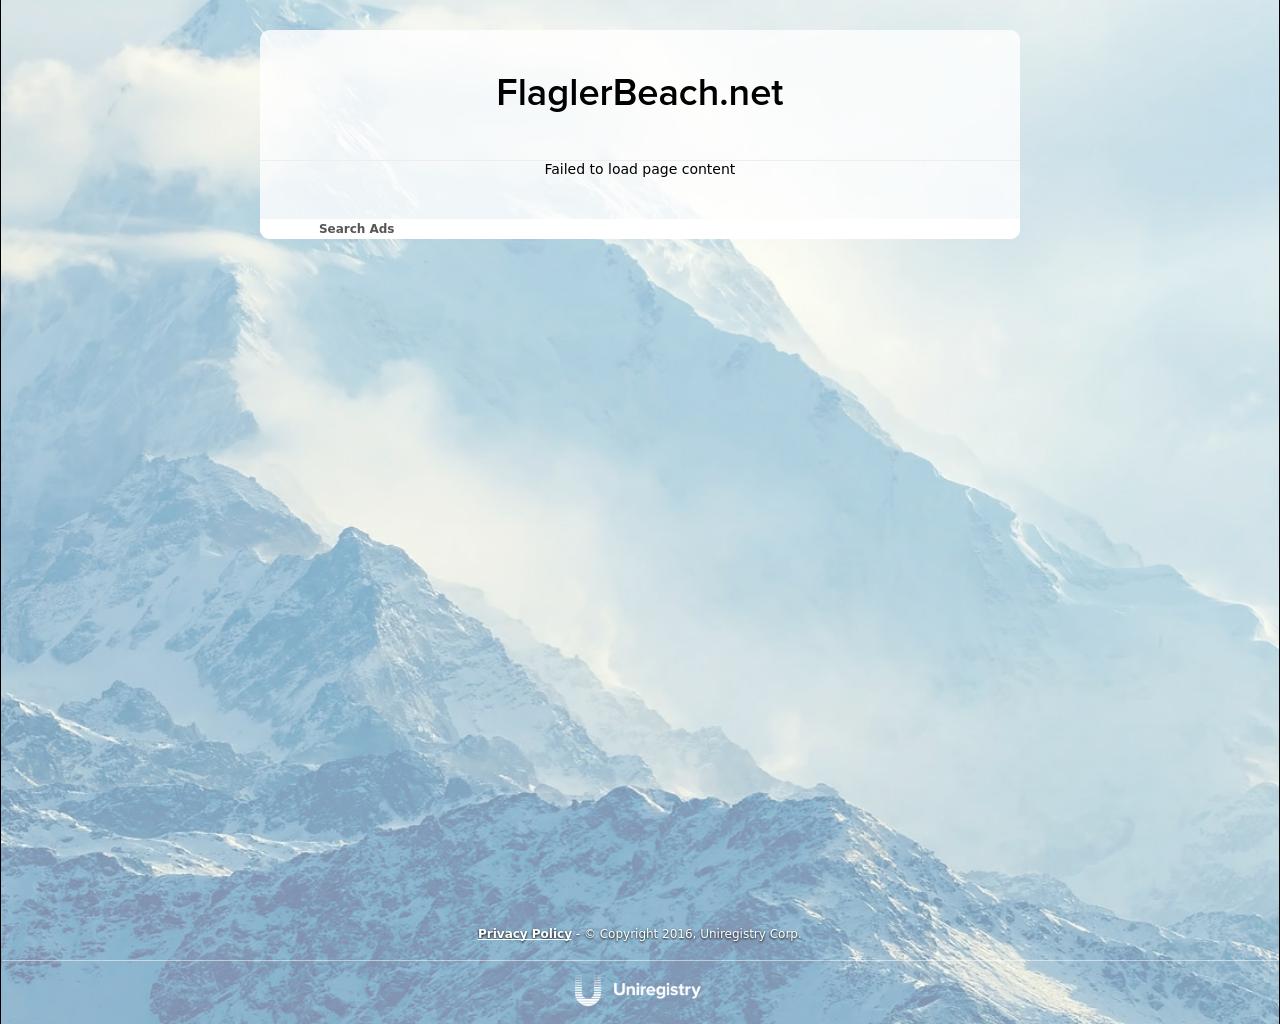 FlaglerBeach.net-Advertising-Reviews-Pricing